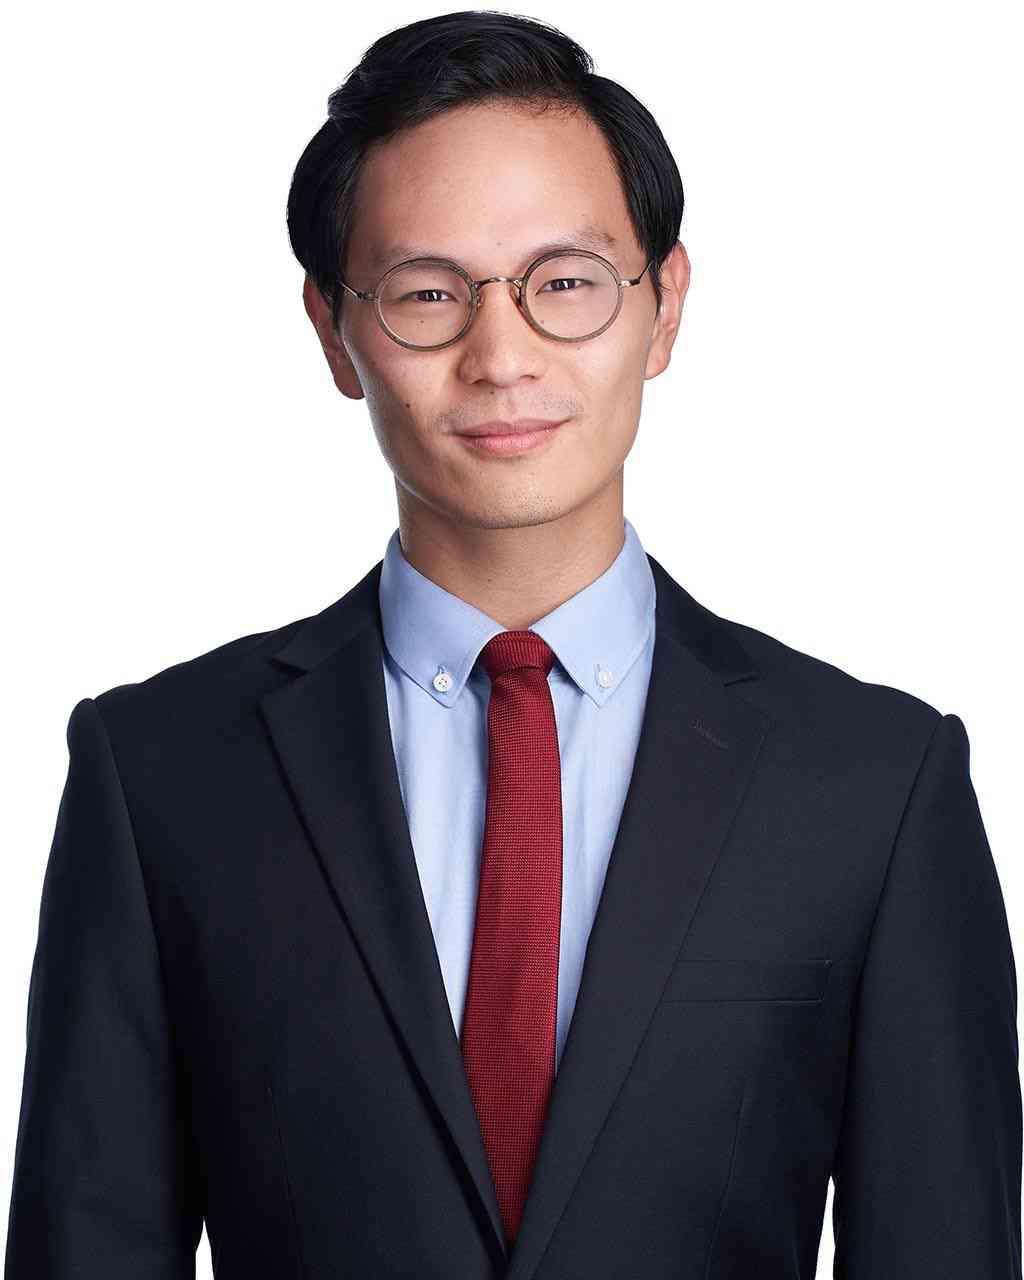 Corporate Business Portrait